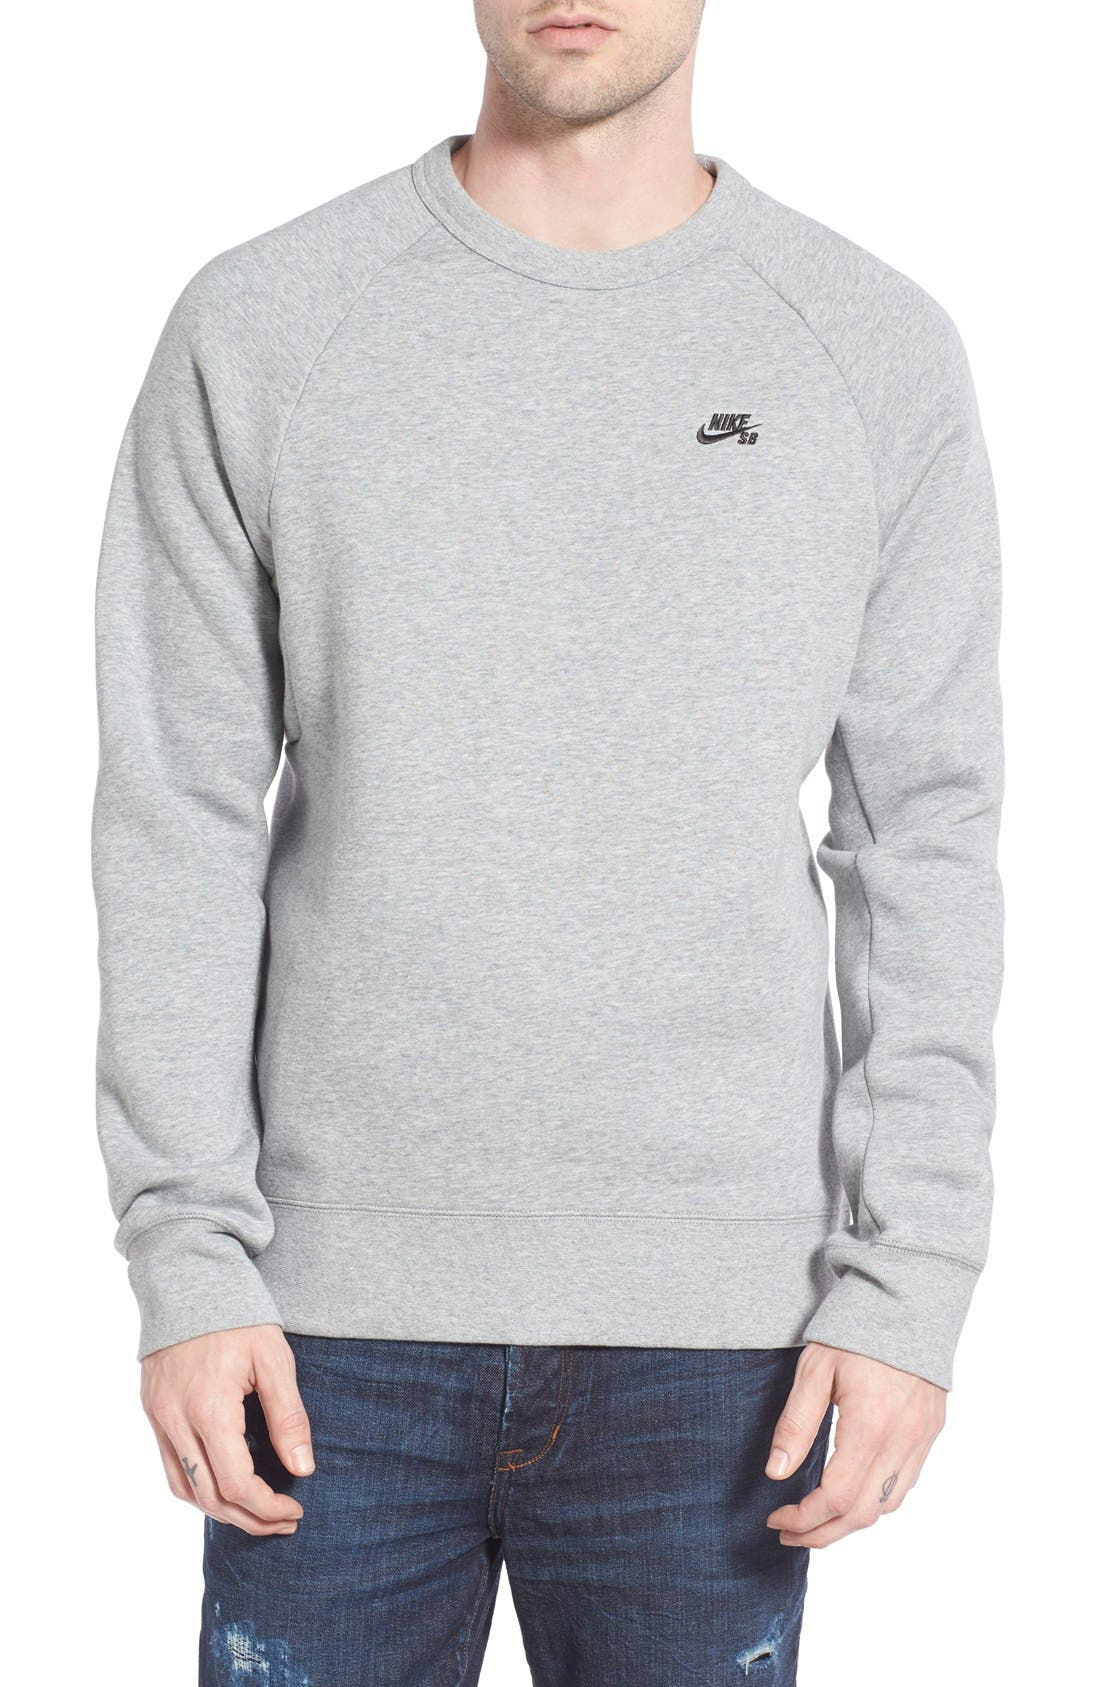 Alternate Image 1 Selected - Nike SB 'Icon' Raglan Sweatshirt